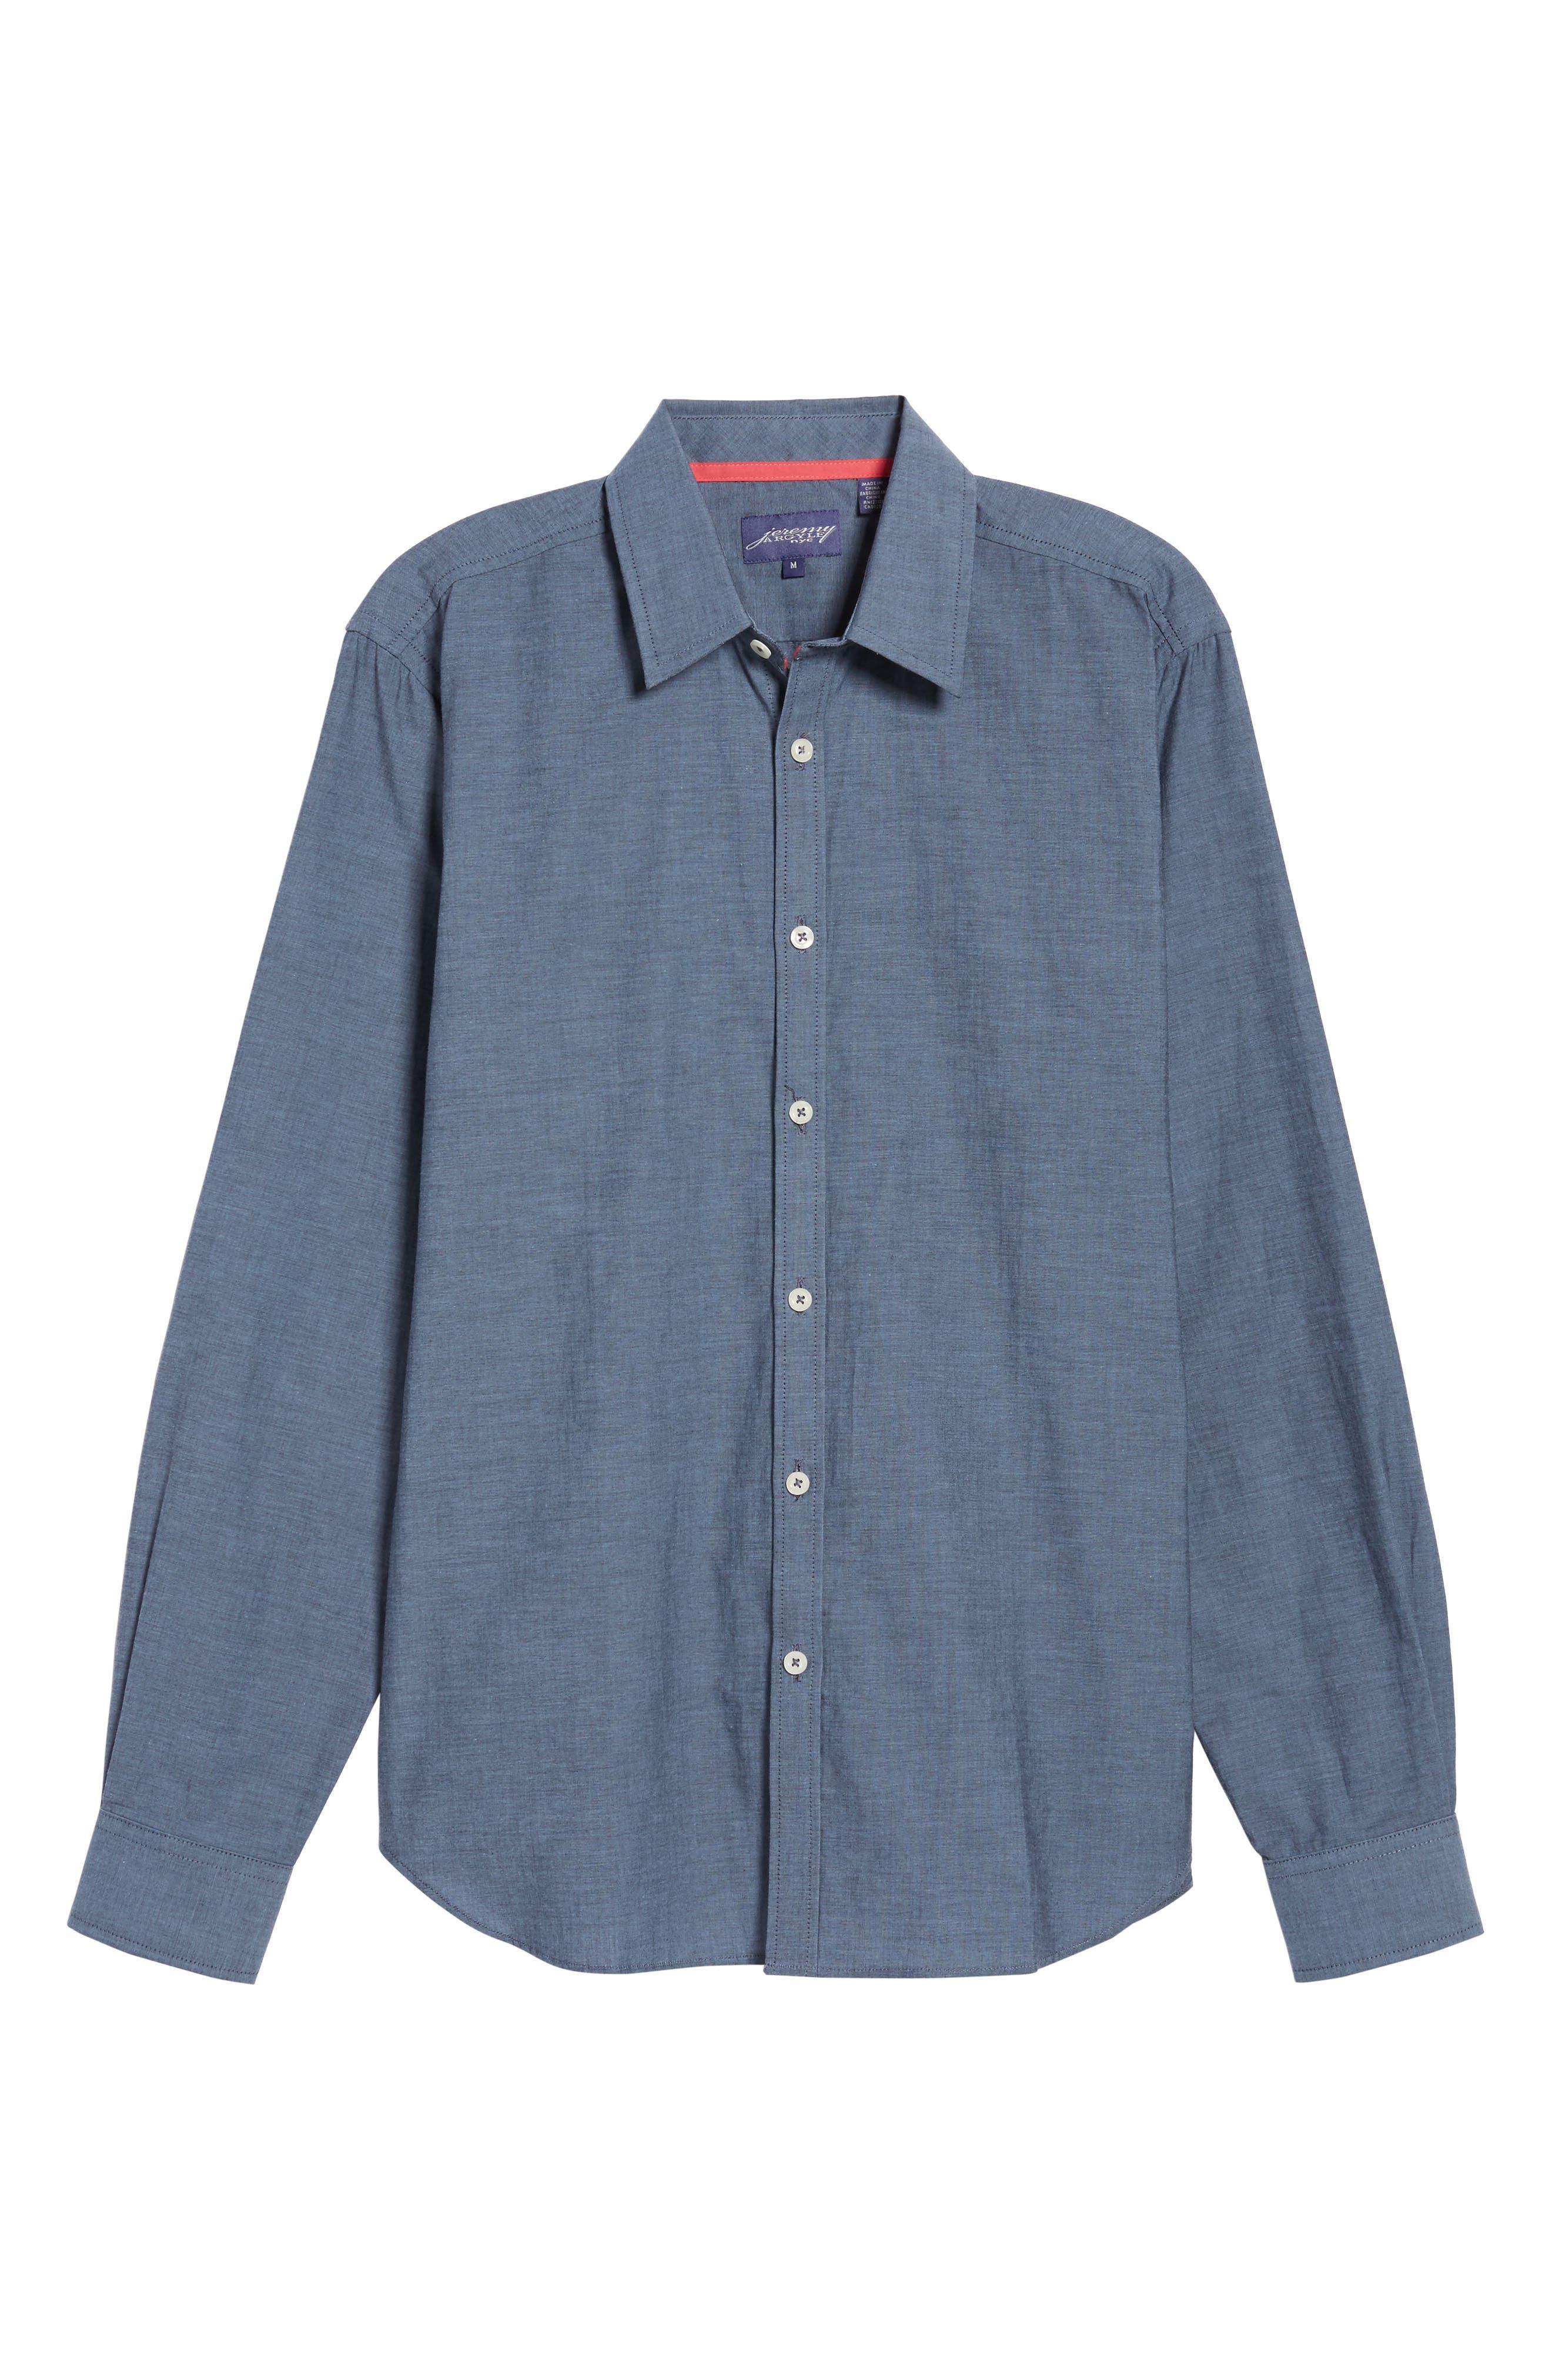 Fitted Sport Shirt,                             Alternate thumbnail 6, color,                             Medium Blue